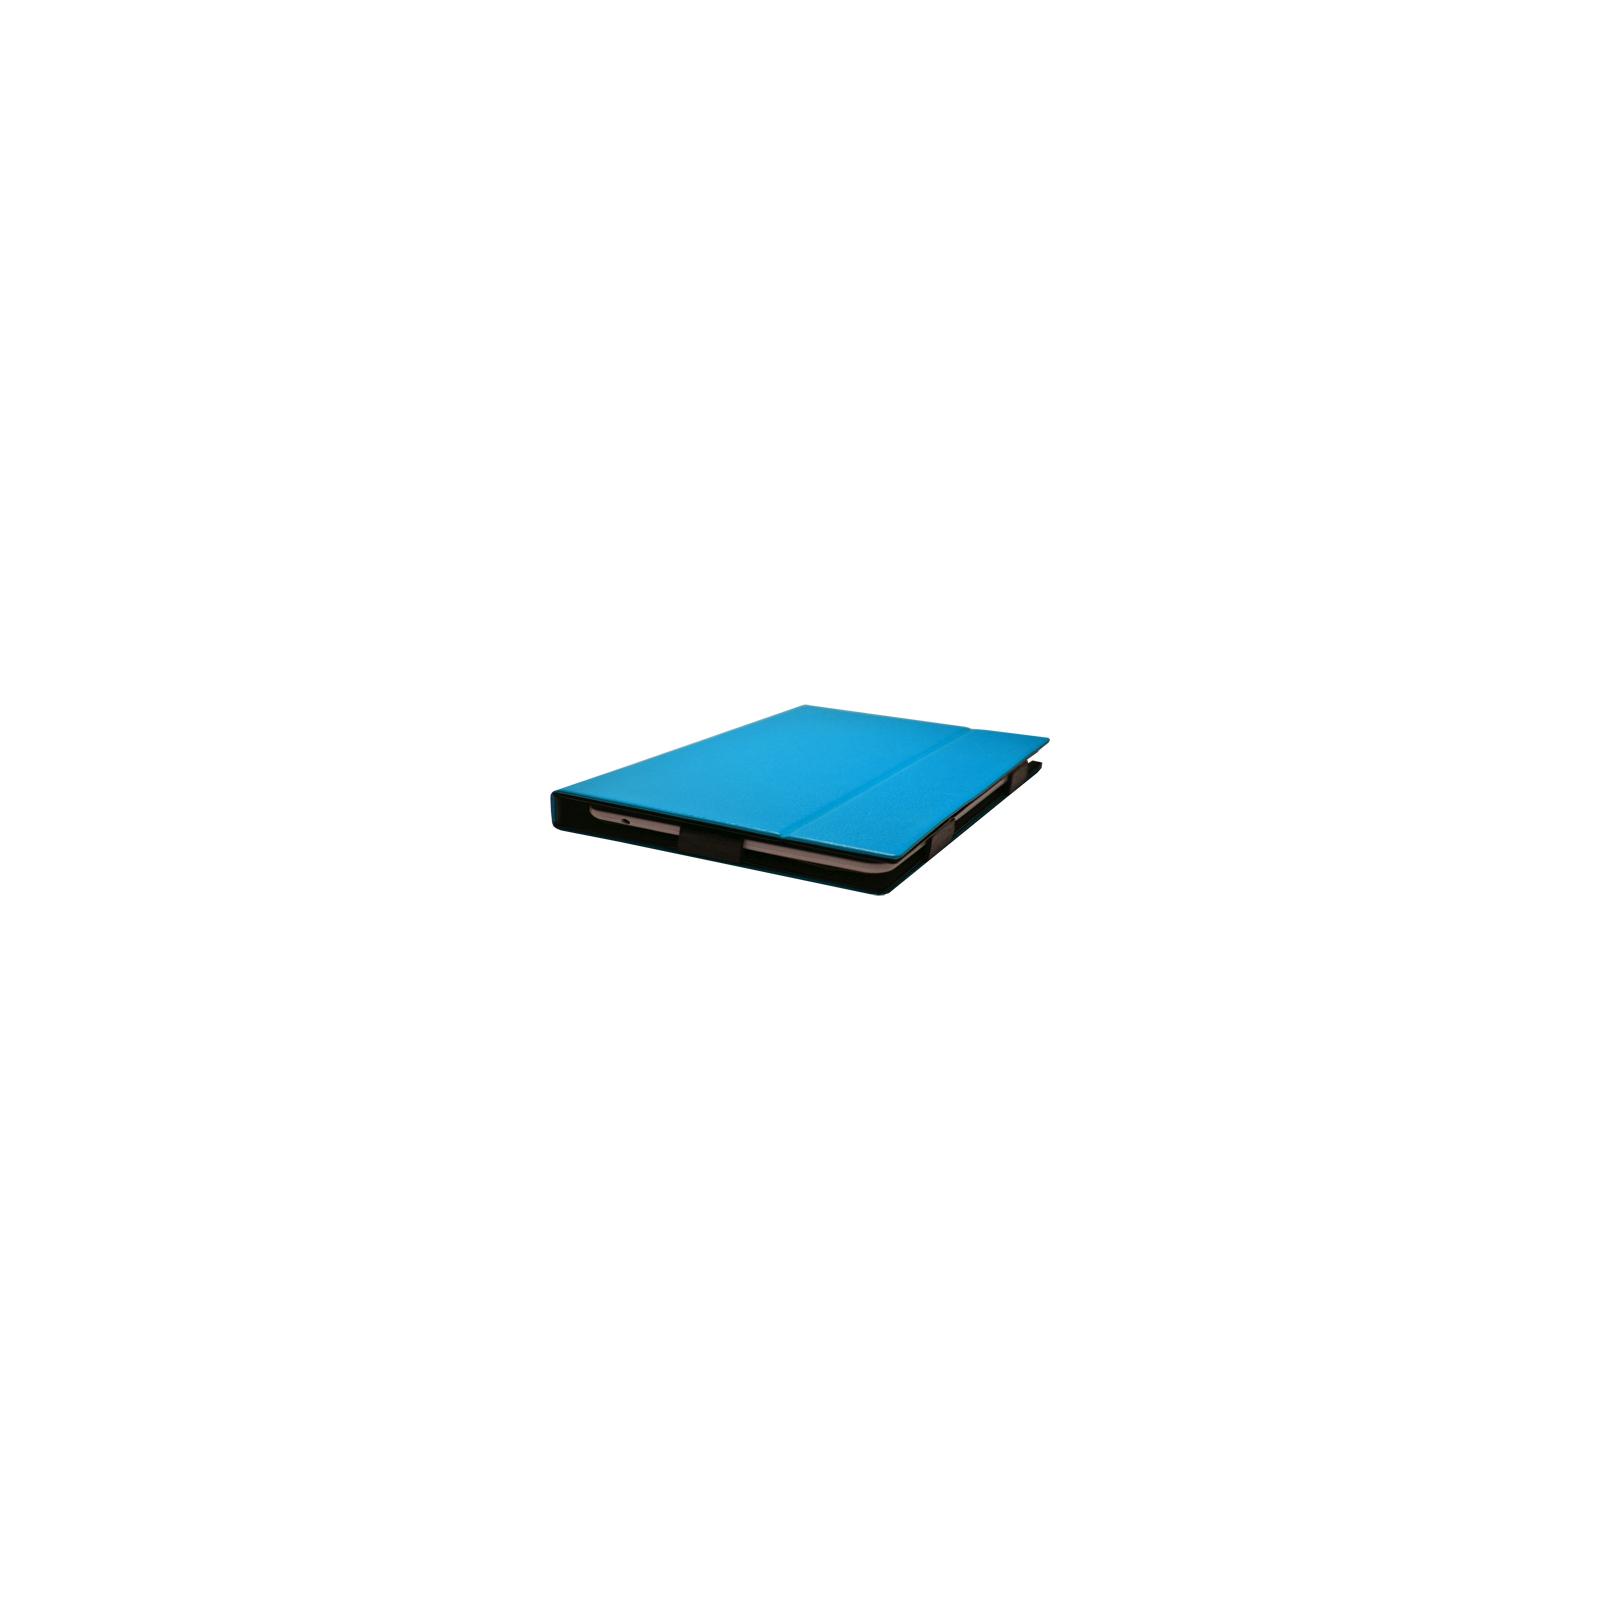 Чехол для планшета Vento 9 Desire Bright -blue изображение 3